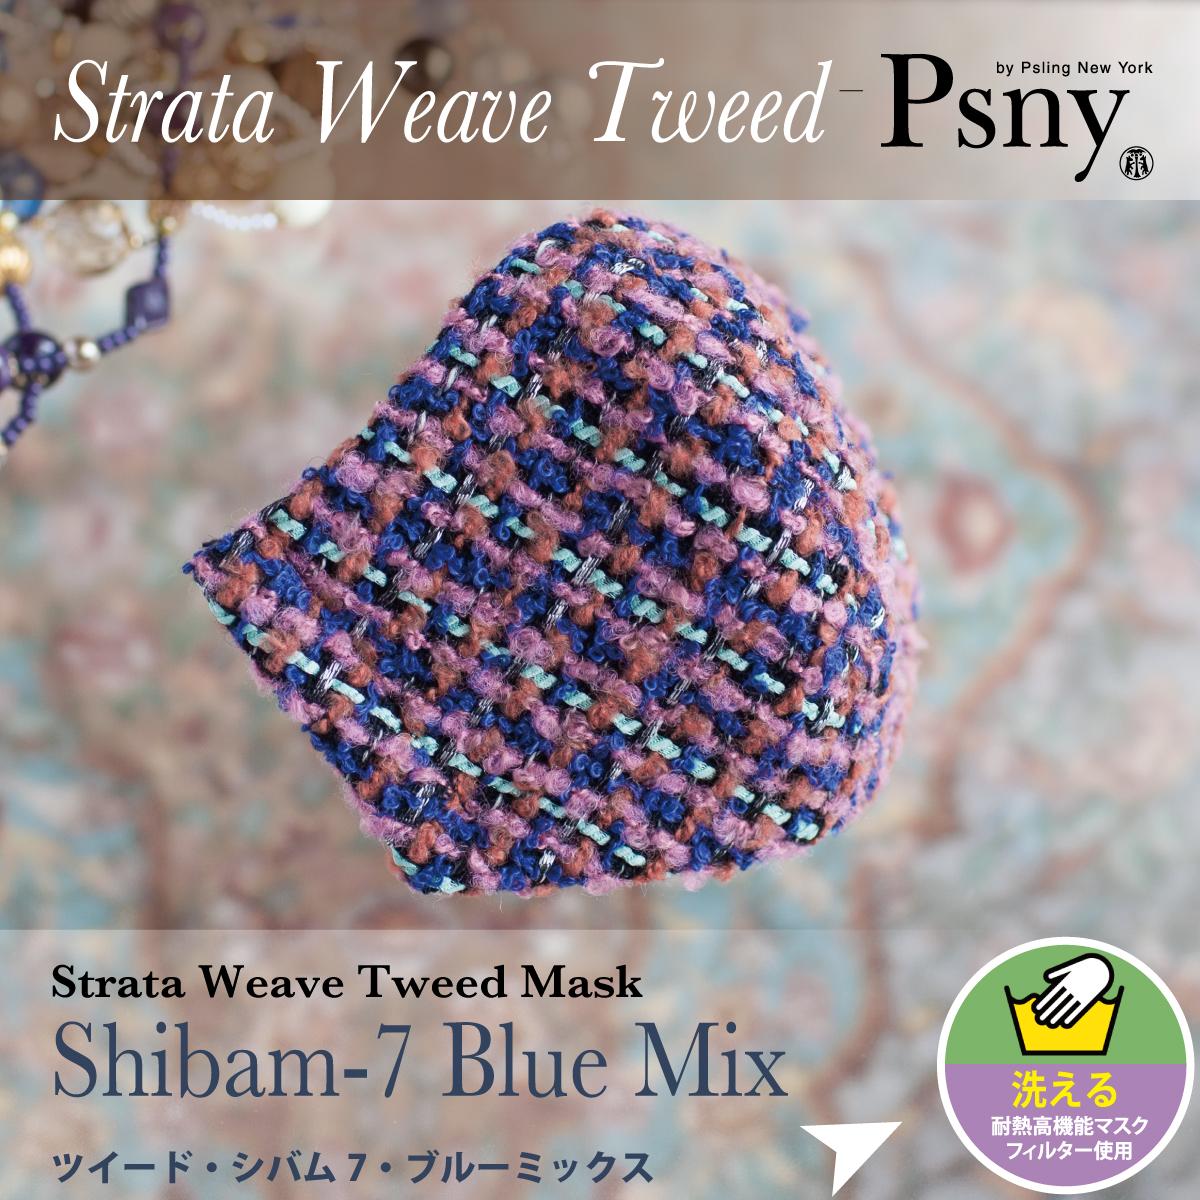 PSNY ツイード・シバム7 洗える不織布フィルター入り 立体 ツィード 高級 保温 保湿 冬 美人 マスク 送料無料 S07